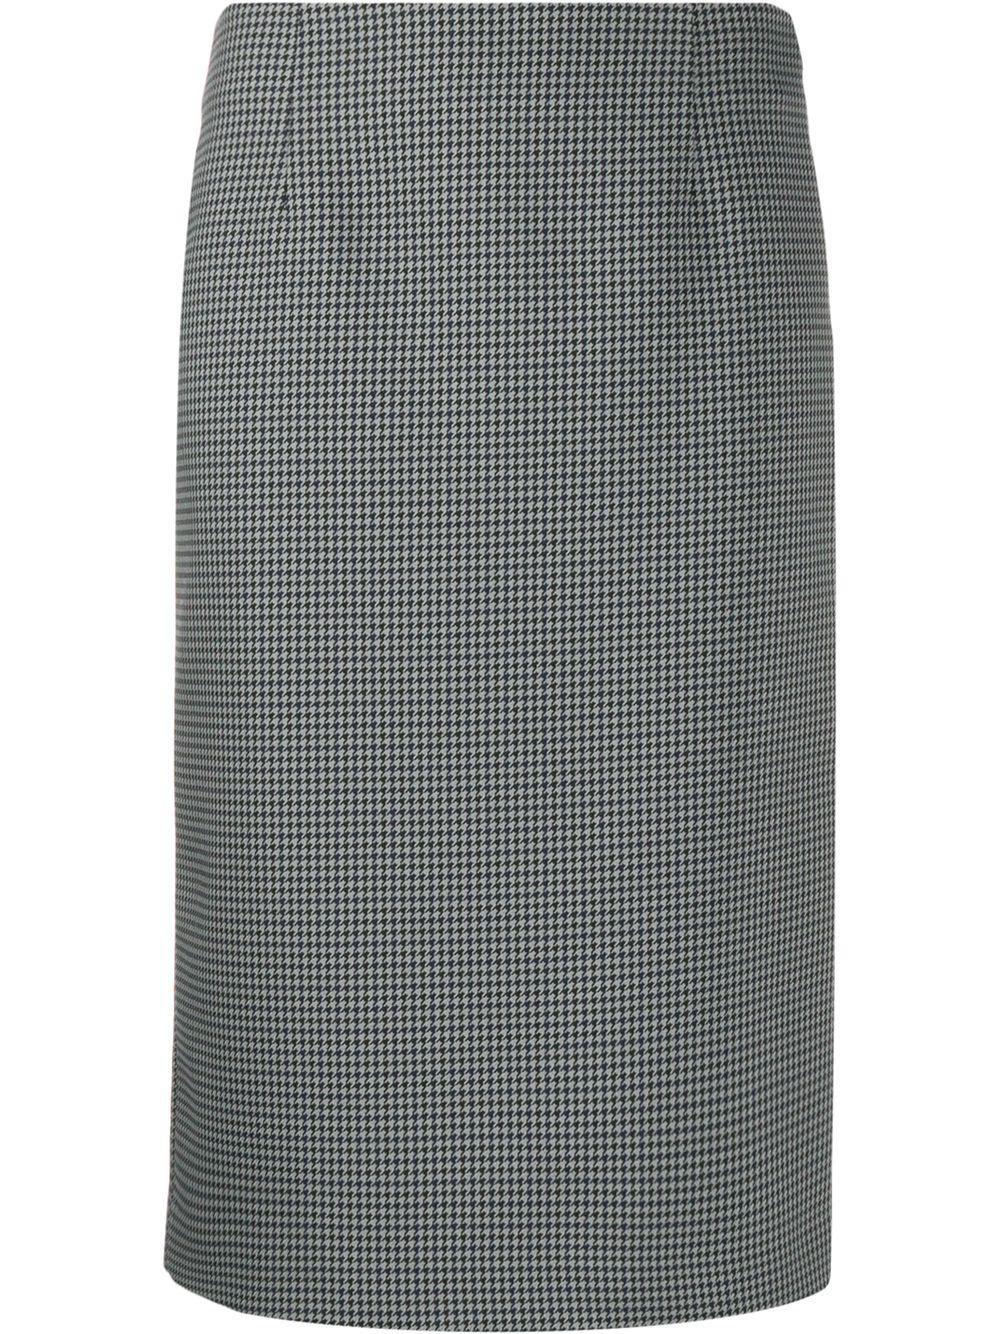 Maison Margiela юбка-карандаш в ломаную клетку